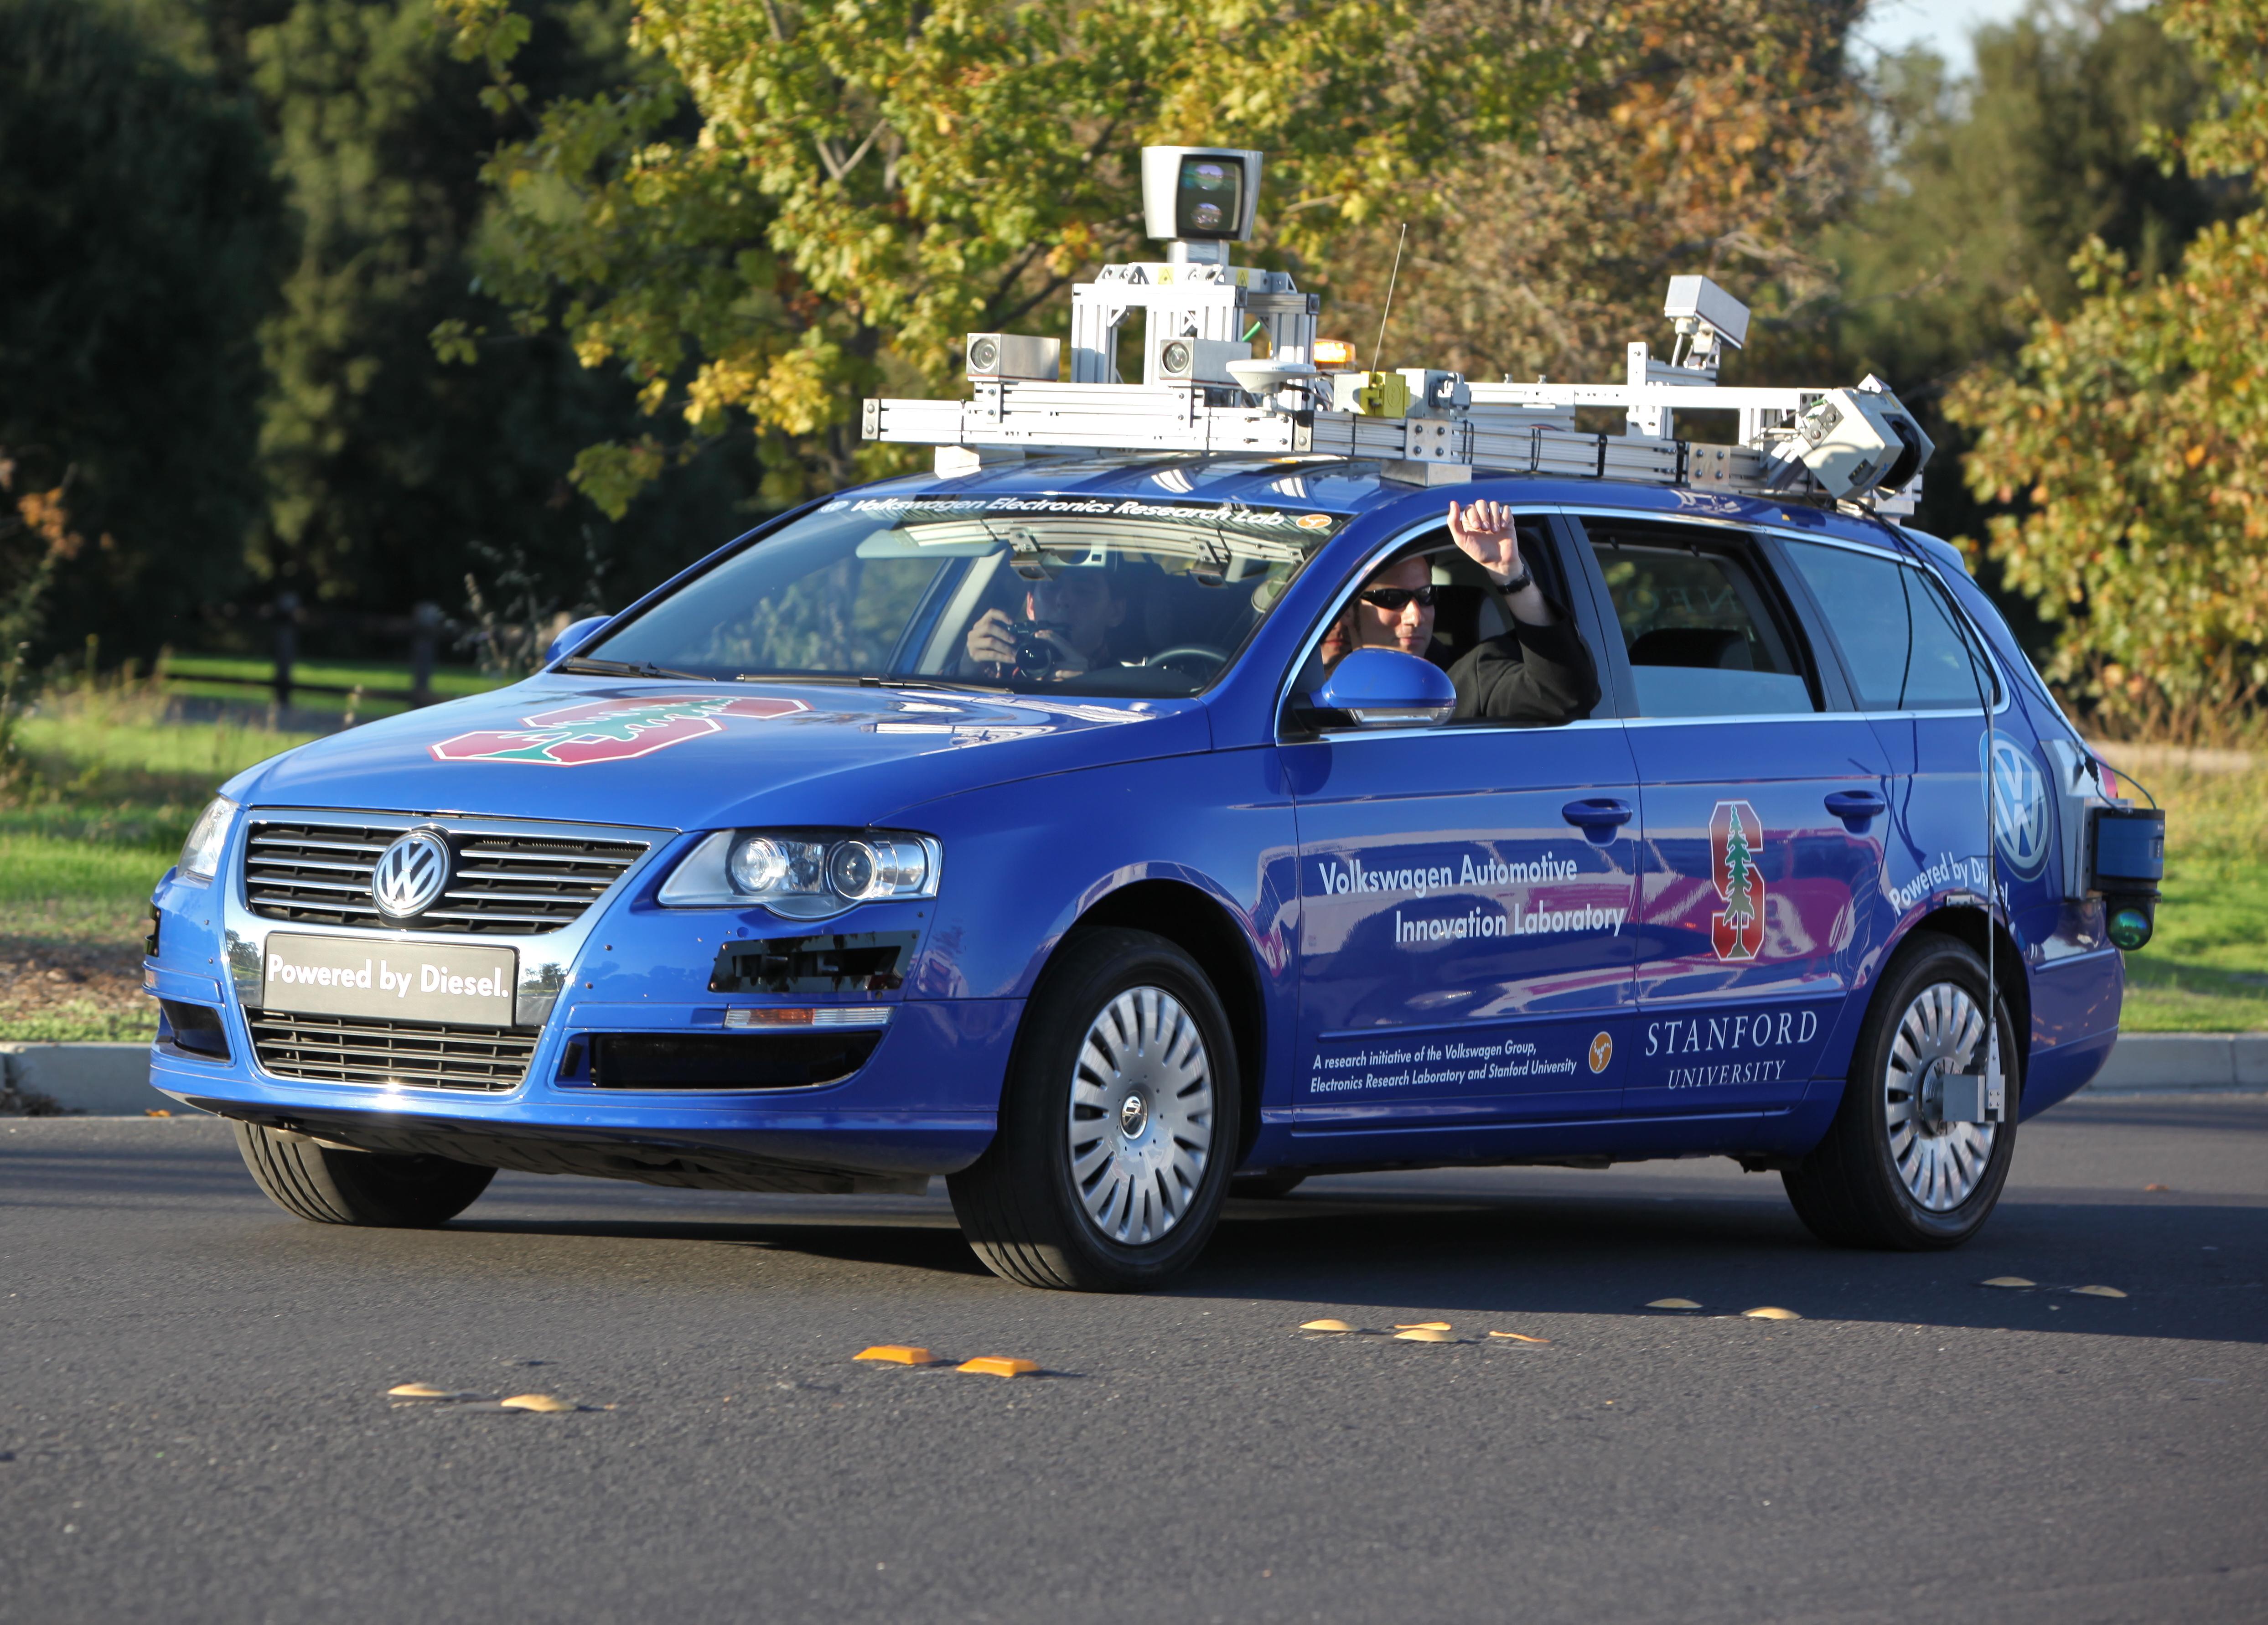 inverse.com - Mike Brown - 2019 Tech Predictions: An Autonomous Car Travels Across the United States